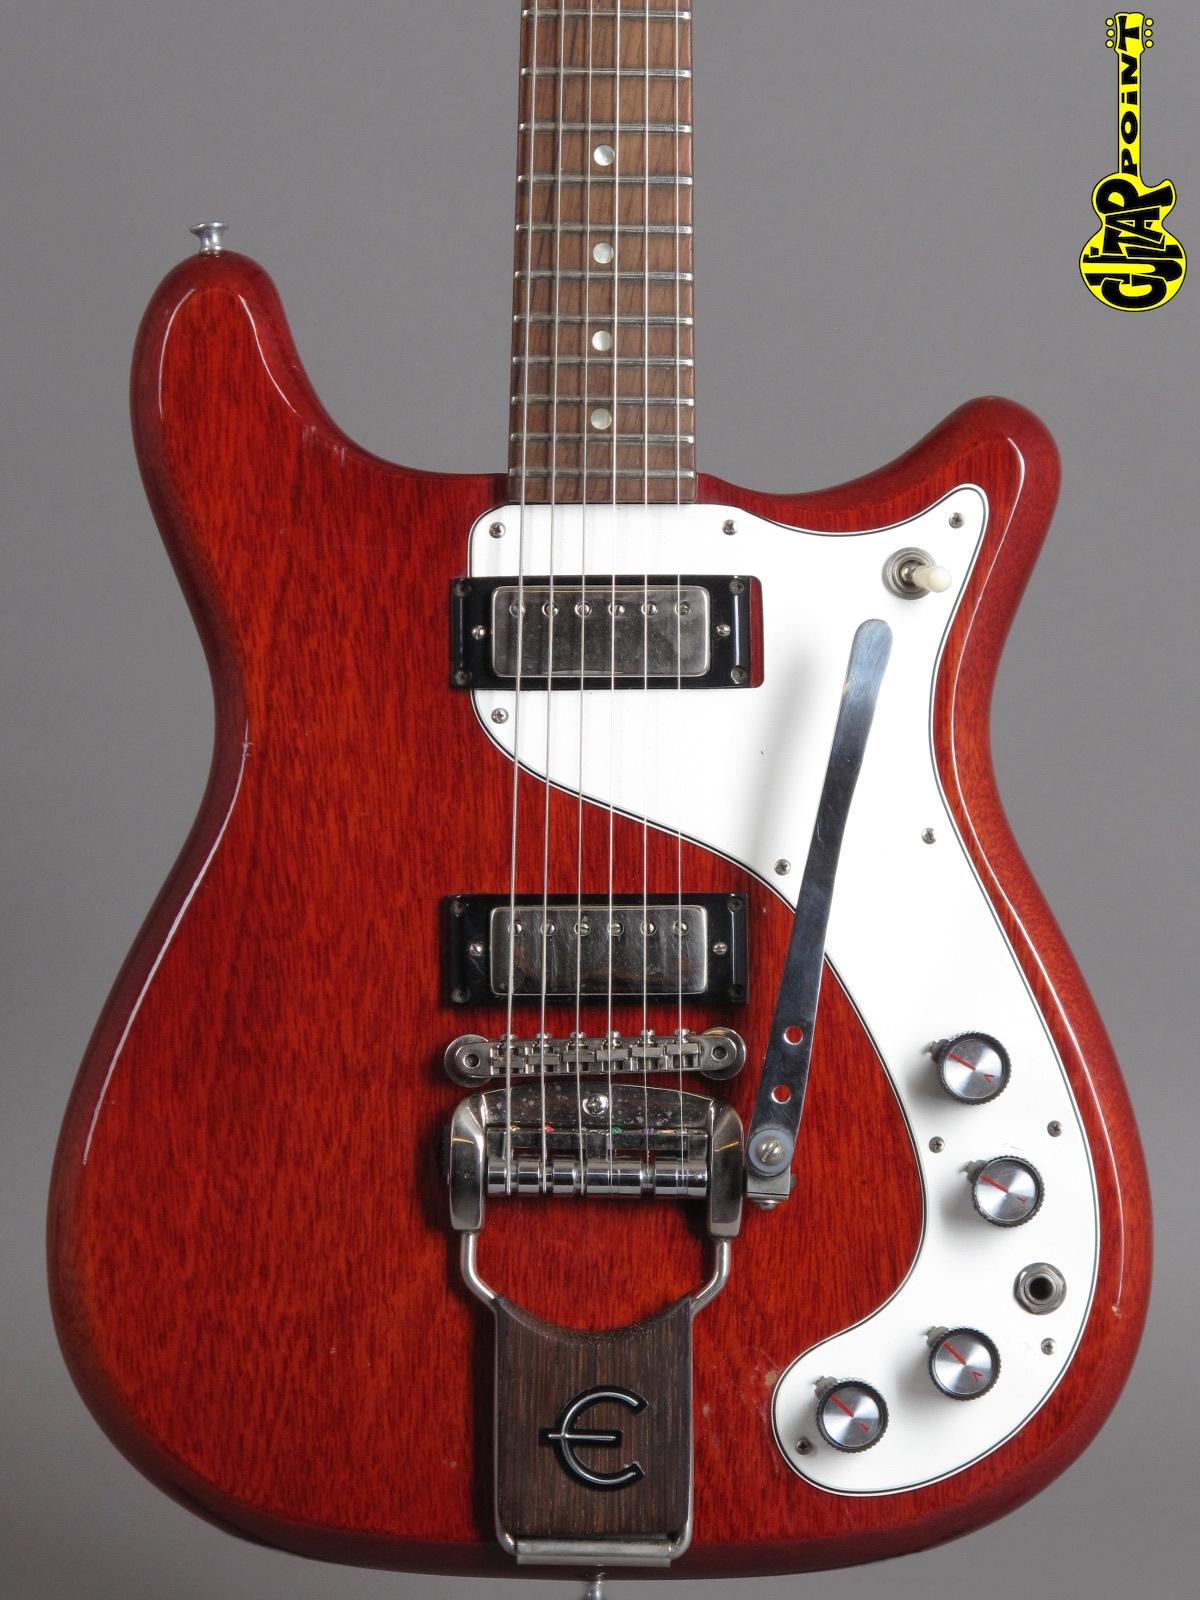 1965 Epiphone Wilshire - Cherry